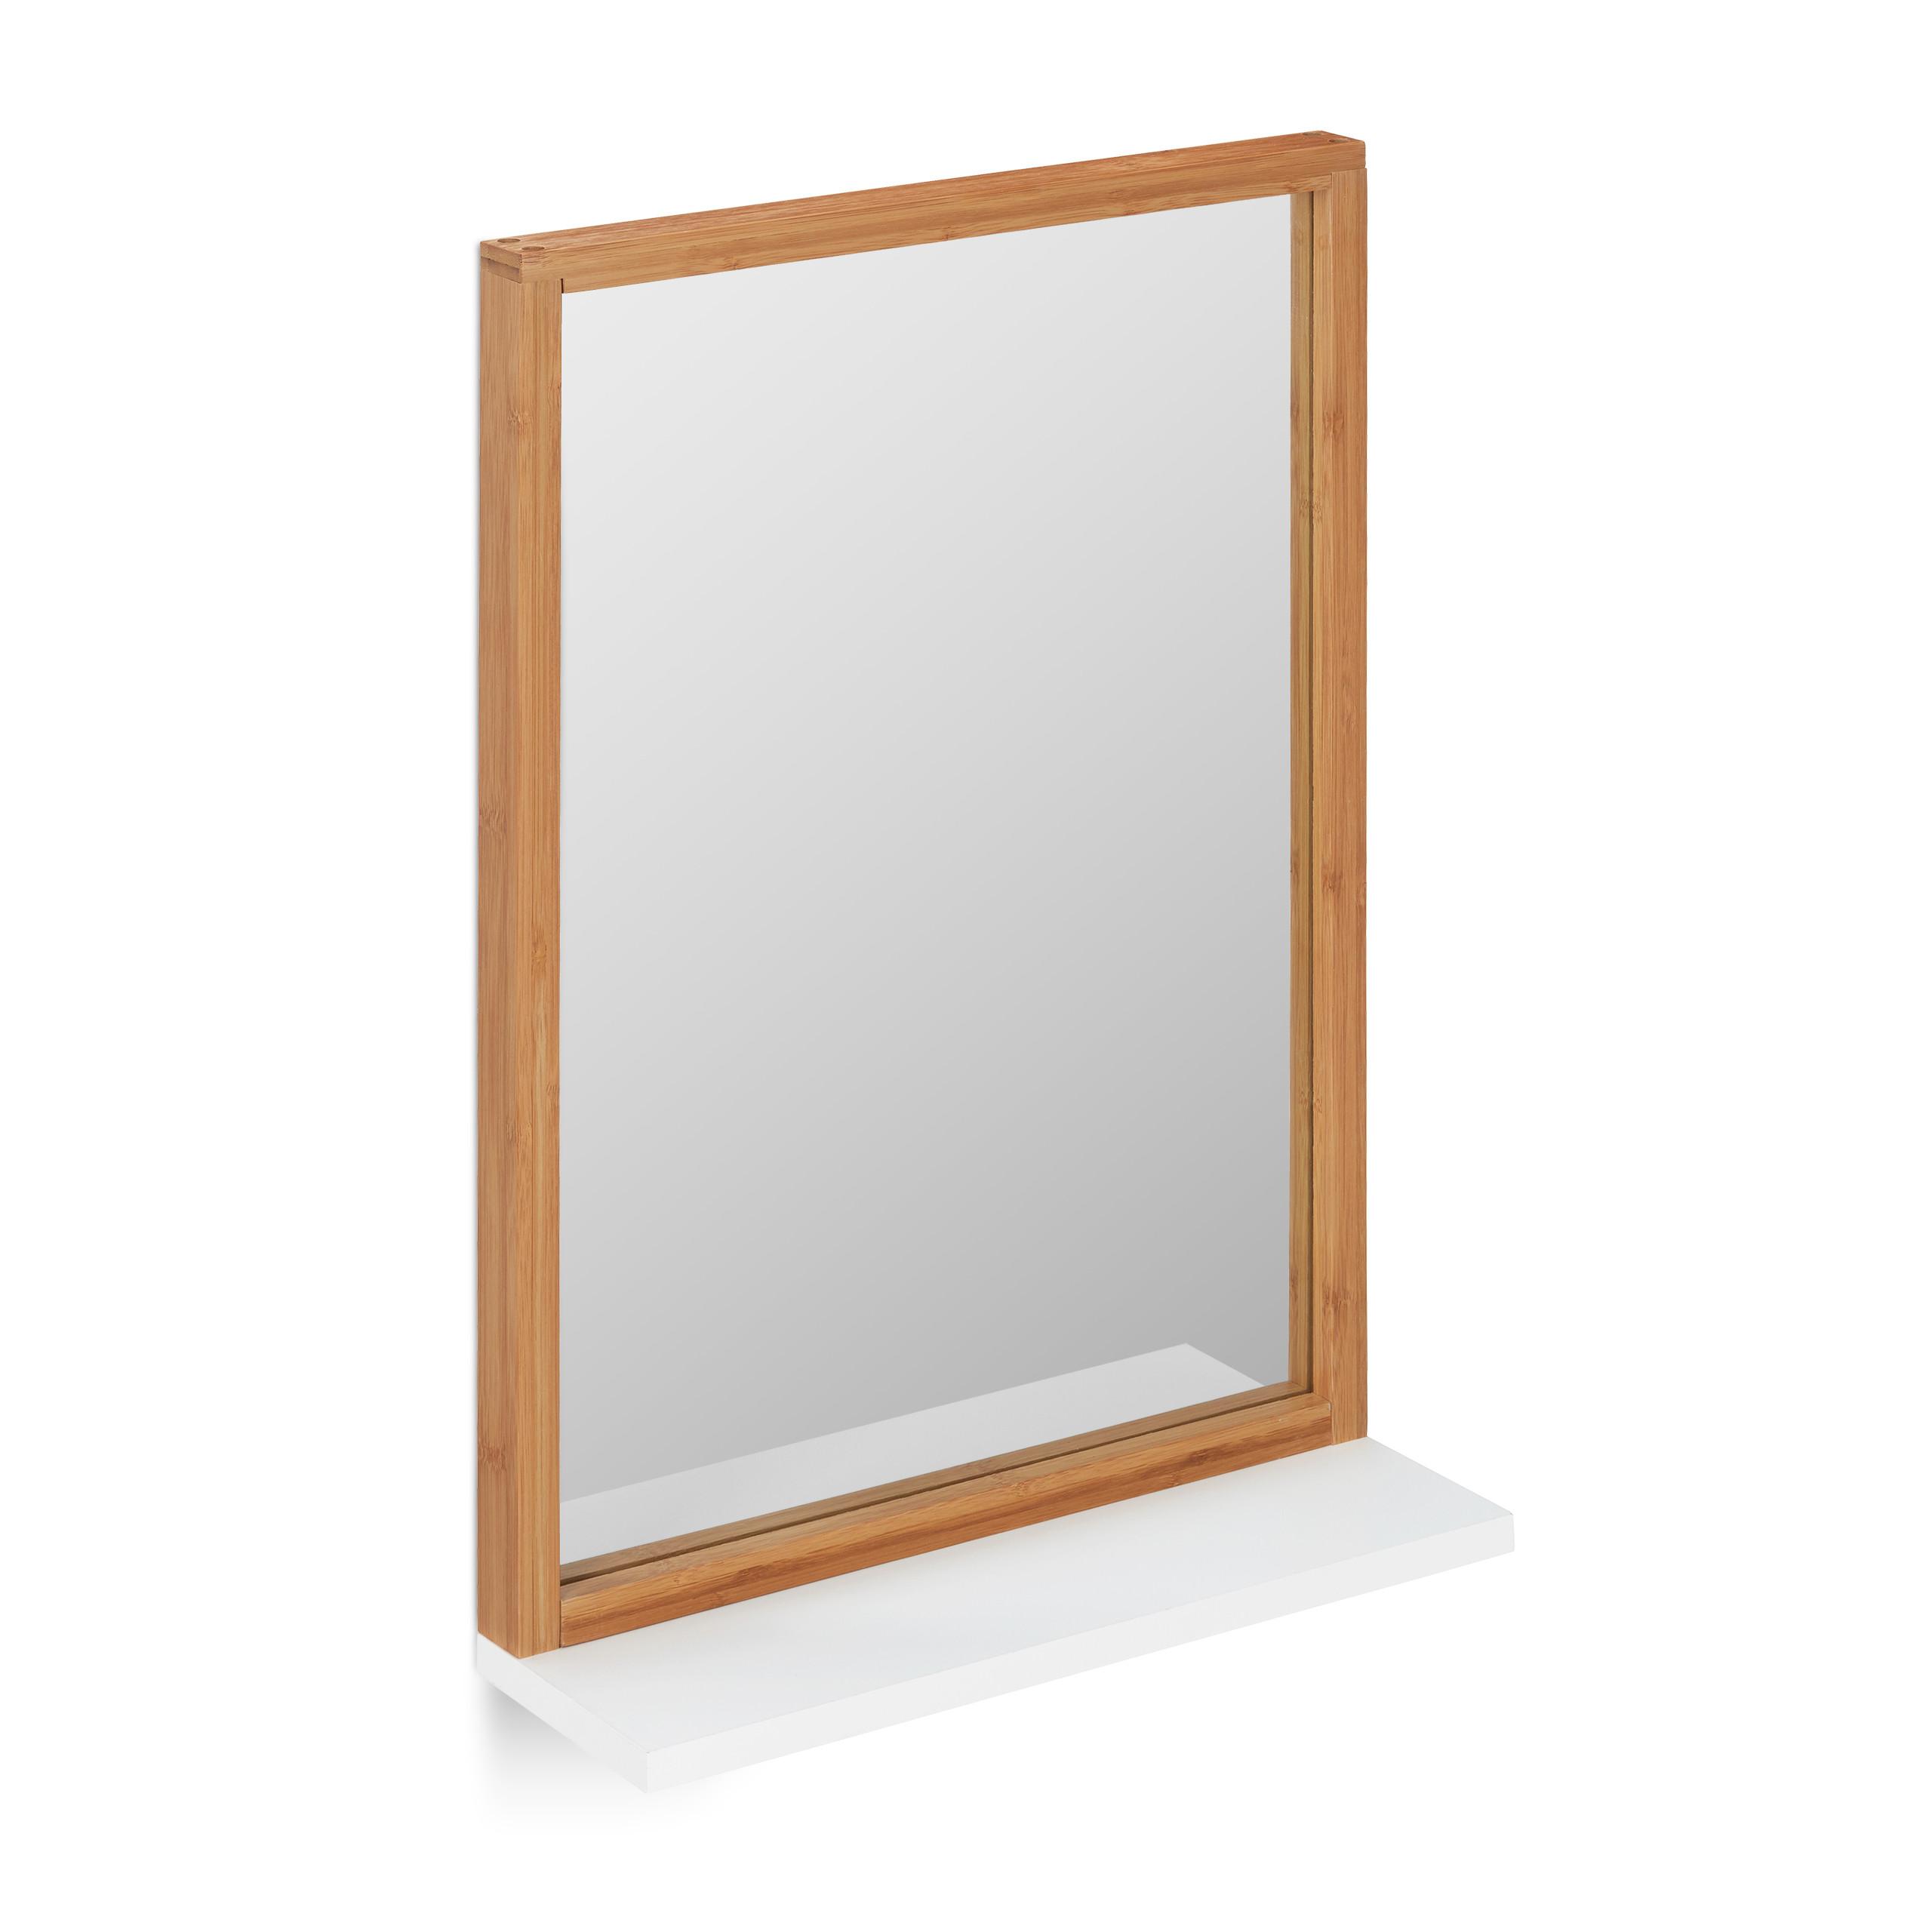 Wandspiegel Flurspiegel Bambus MDF Spiegel Zum Aufhängen